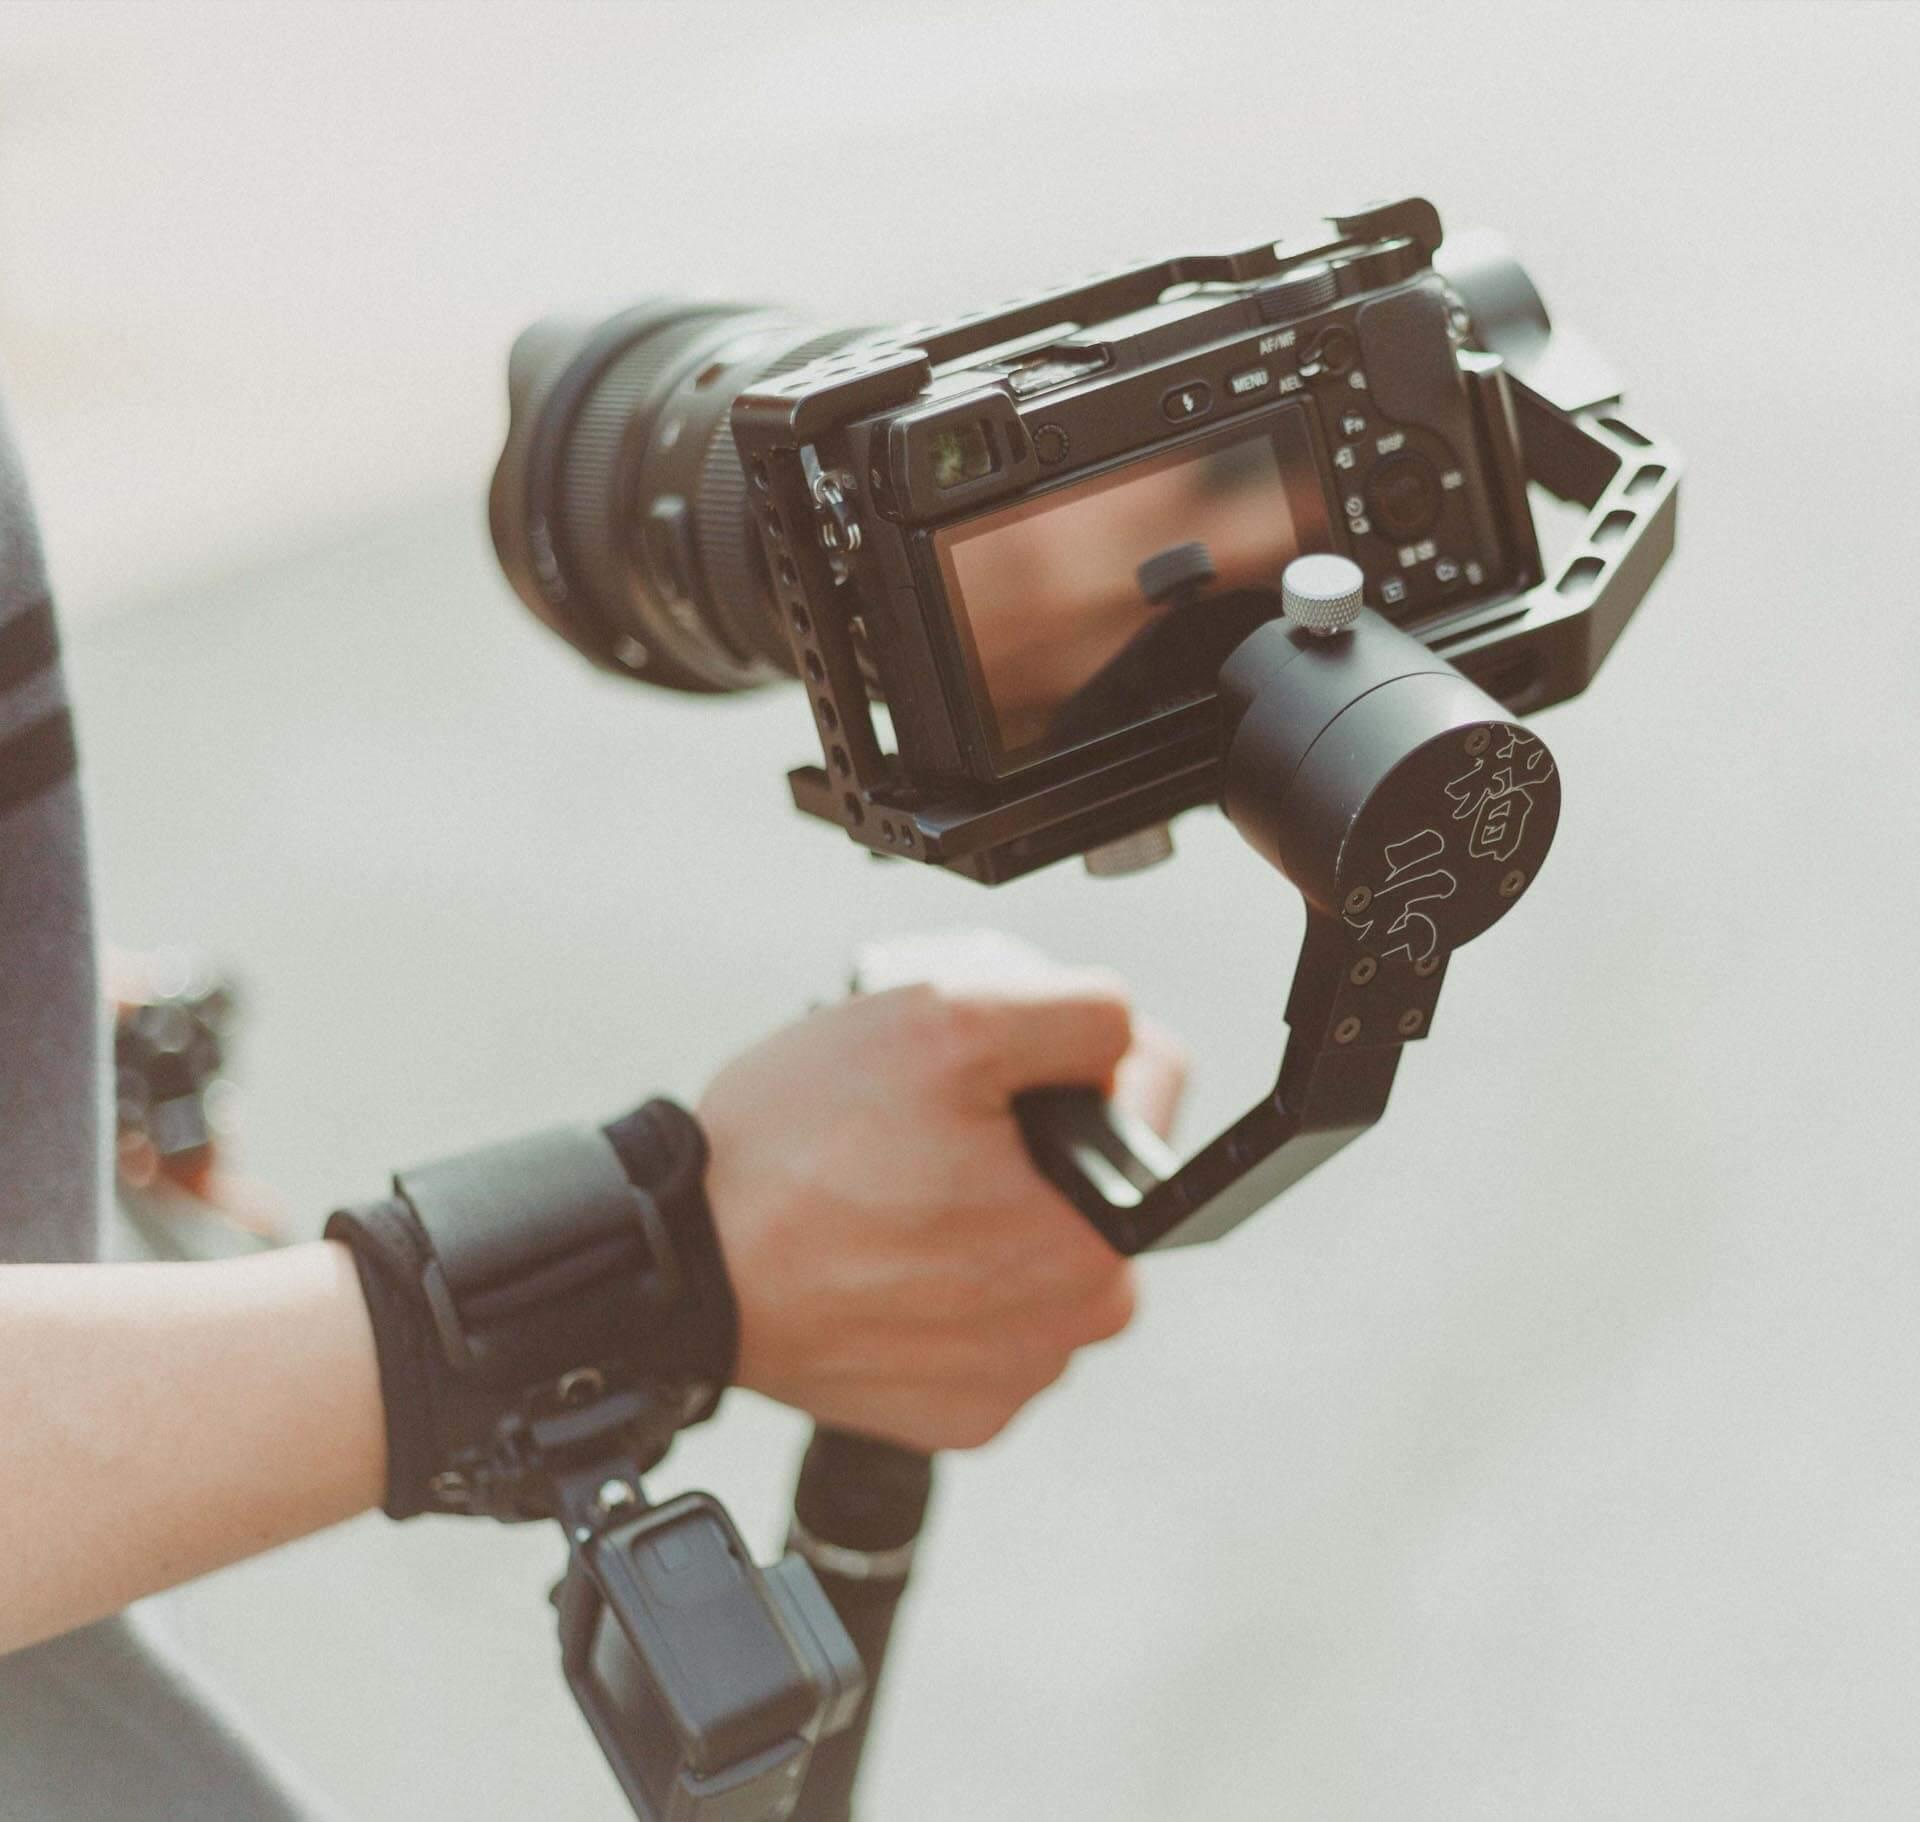 Videography camera